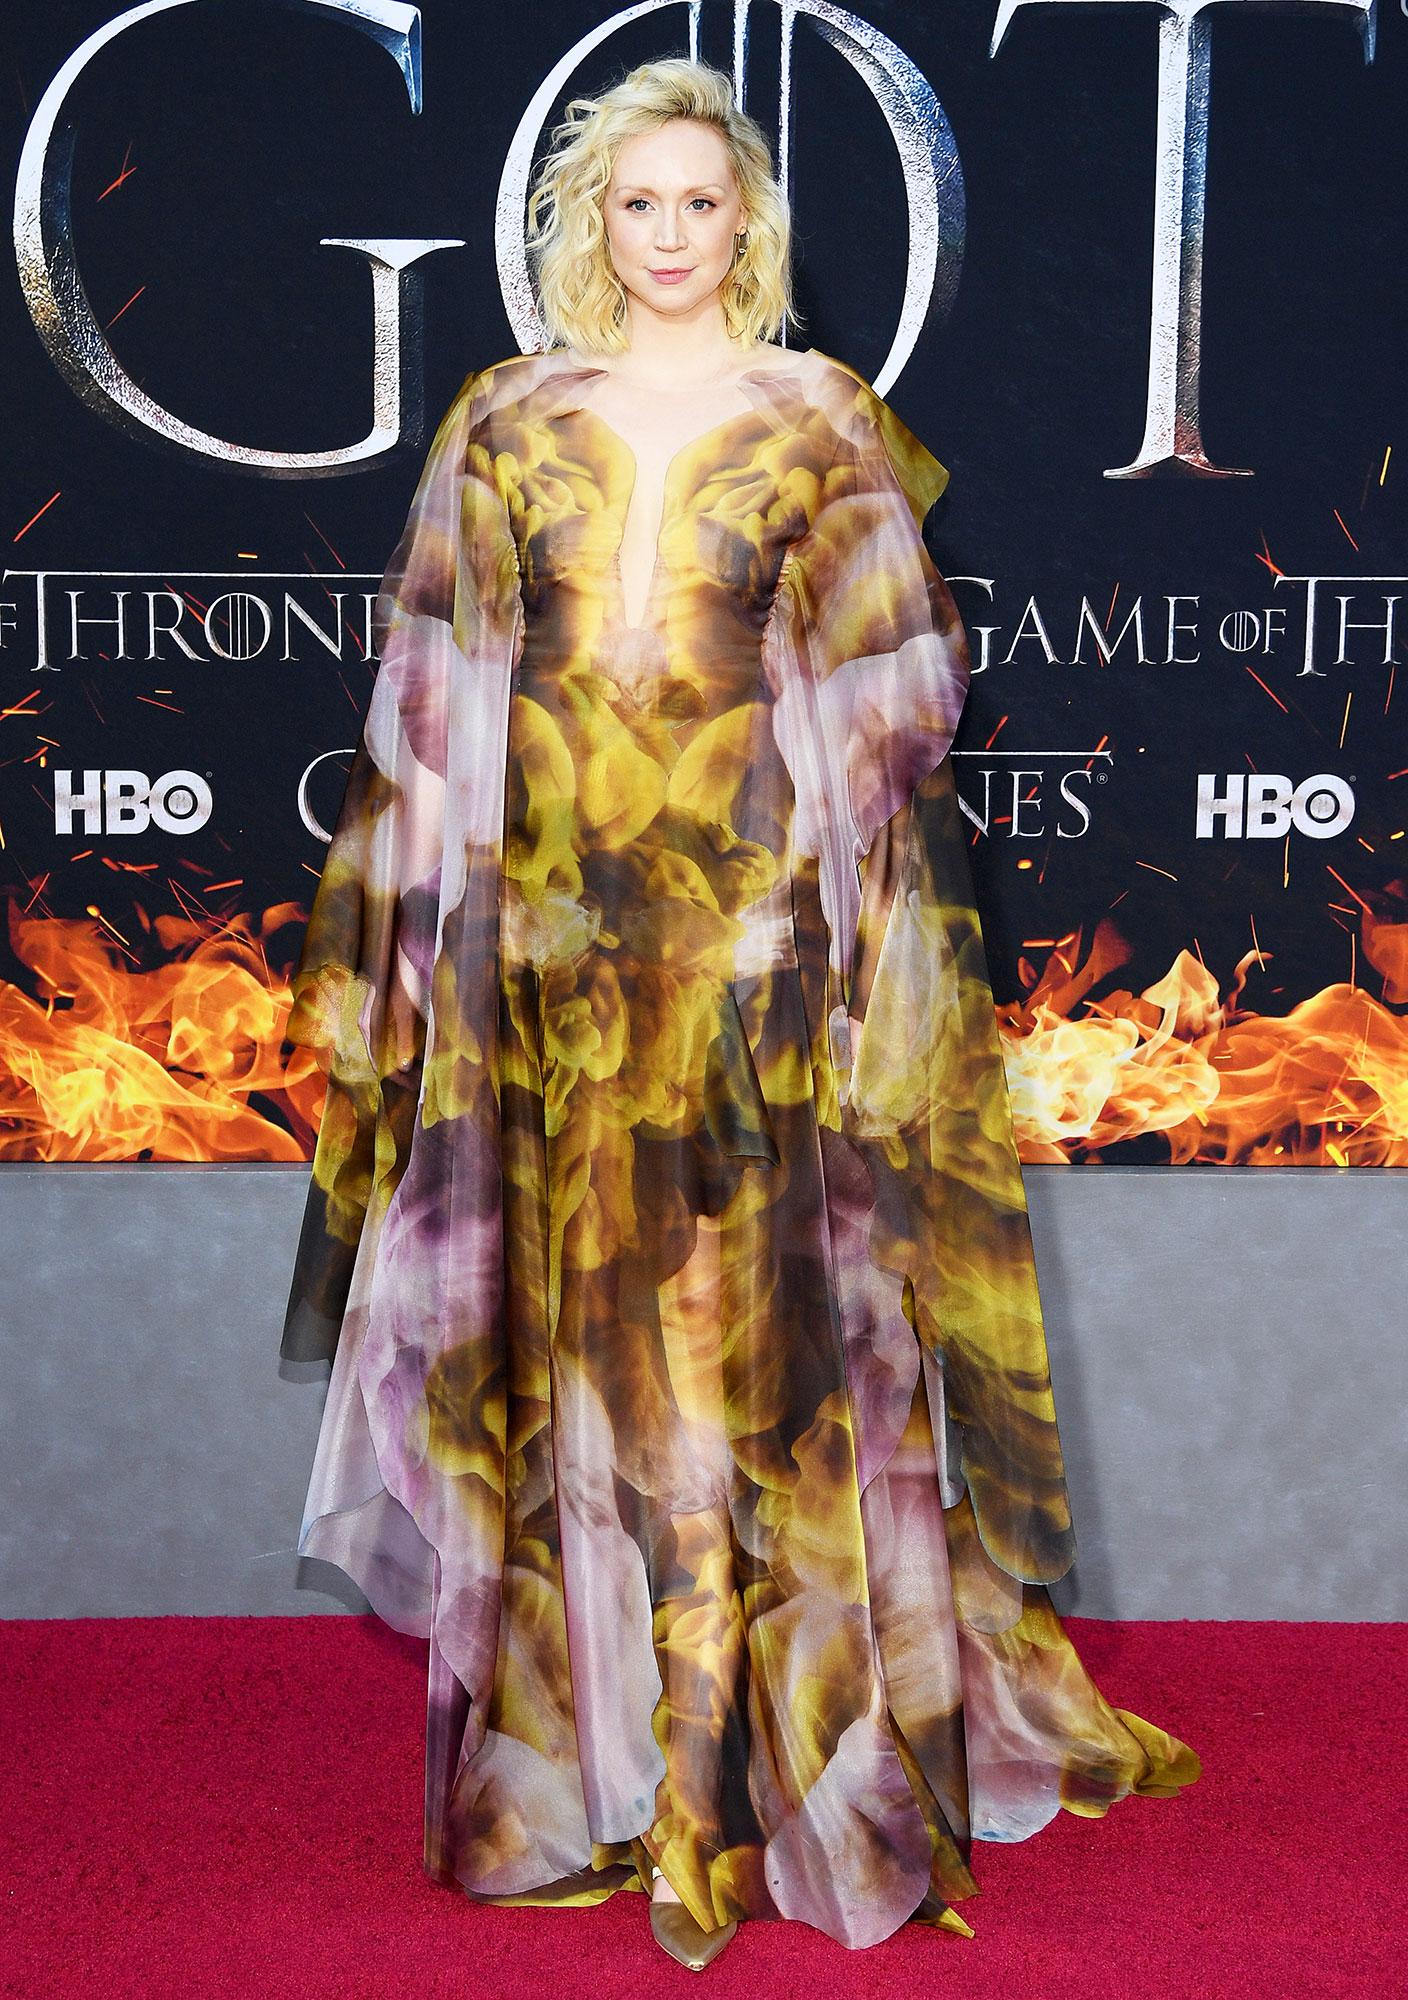 Gwendoline Christie game of thrones - Wearing a flowy, watercolor-inspired Iris van Herpen creation.